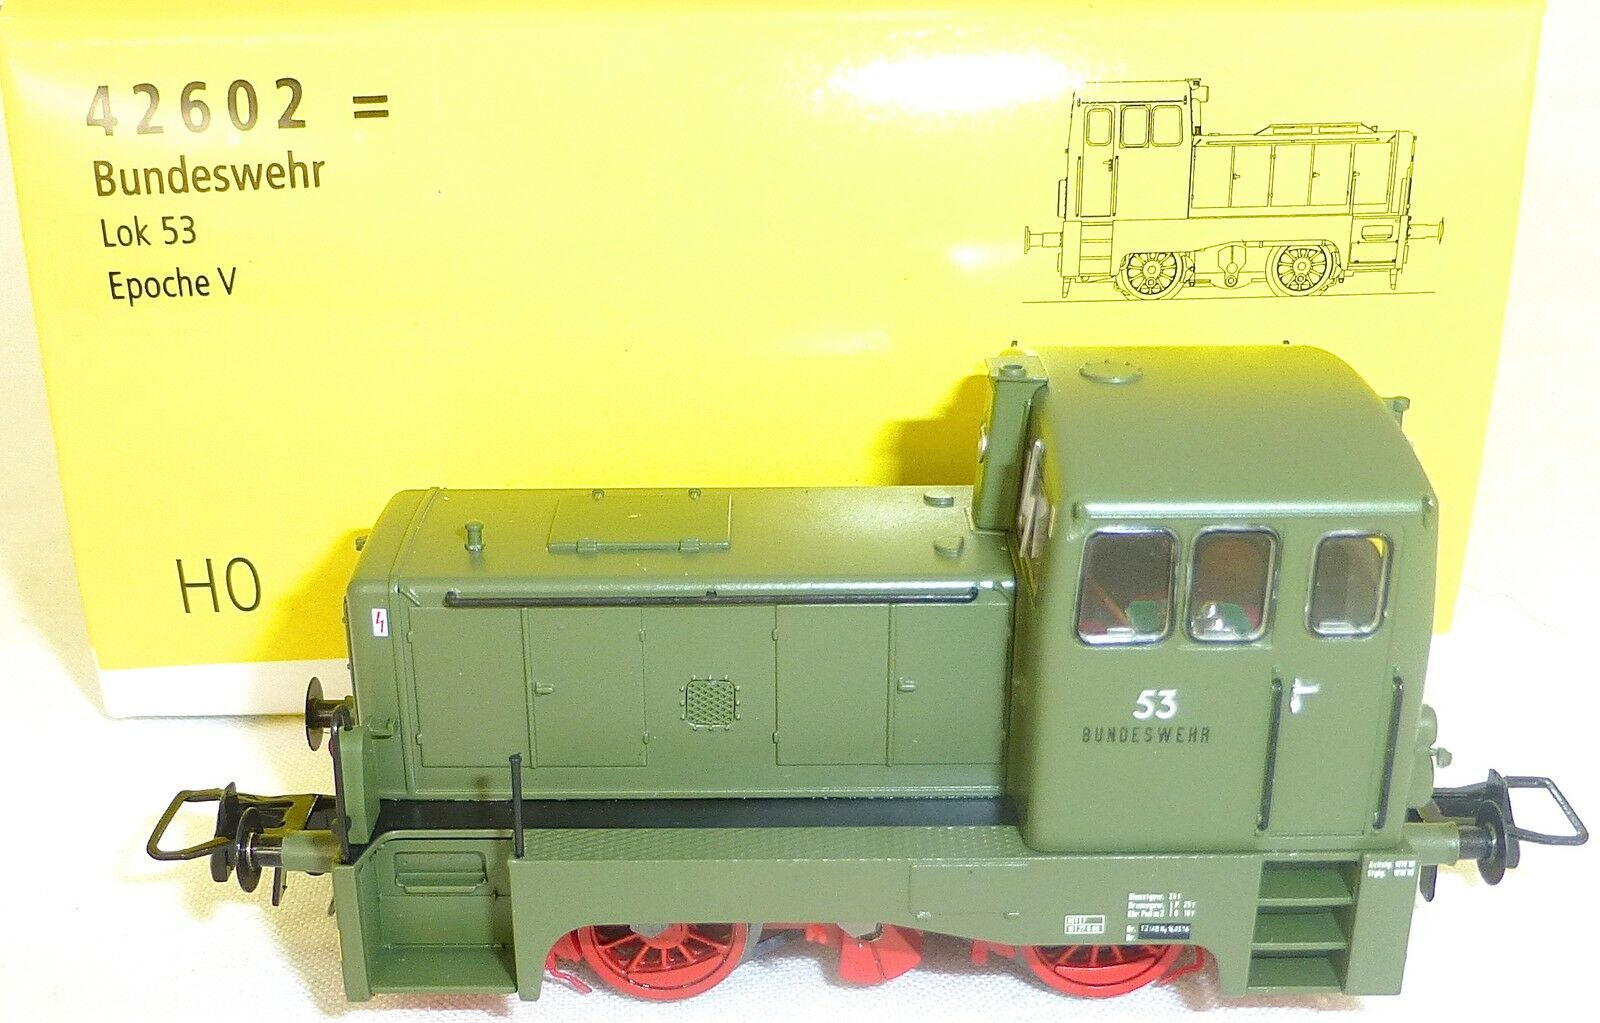 Bundeswehr Locomotive Diesel Locomotive 53 Dss Epv Brawa 42602 Neuf Kb5 Μ